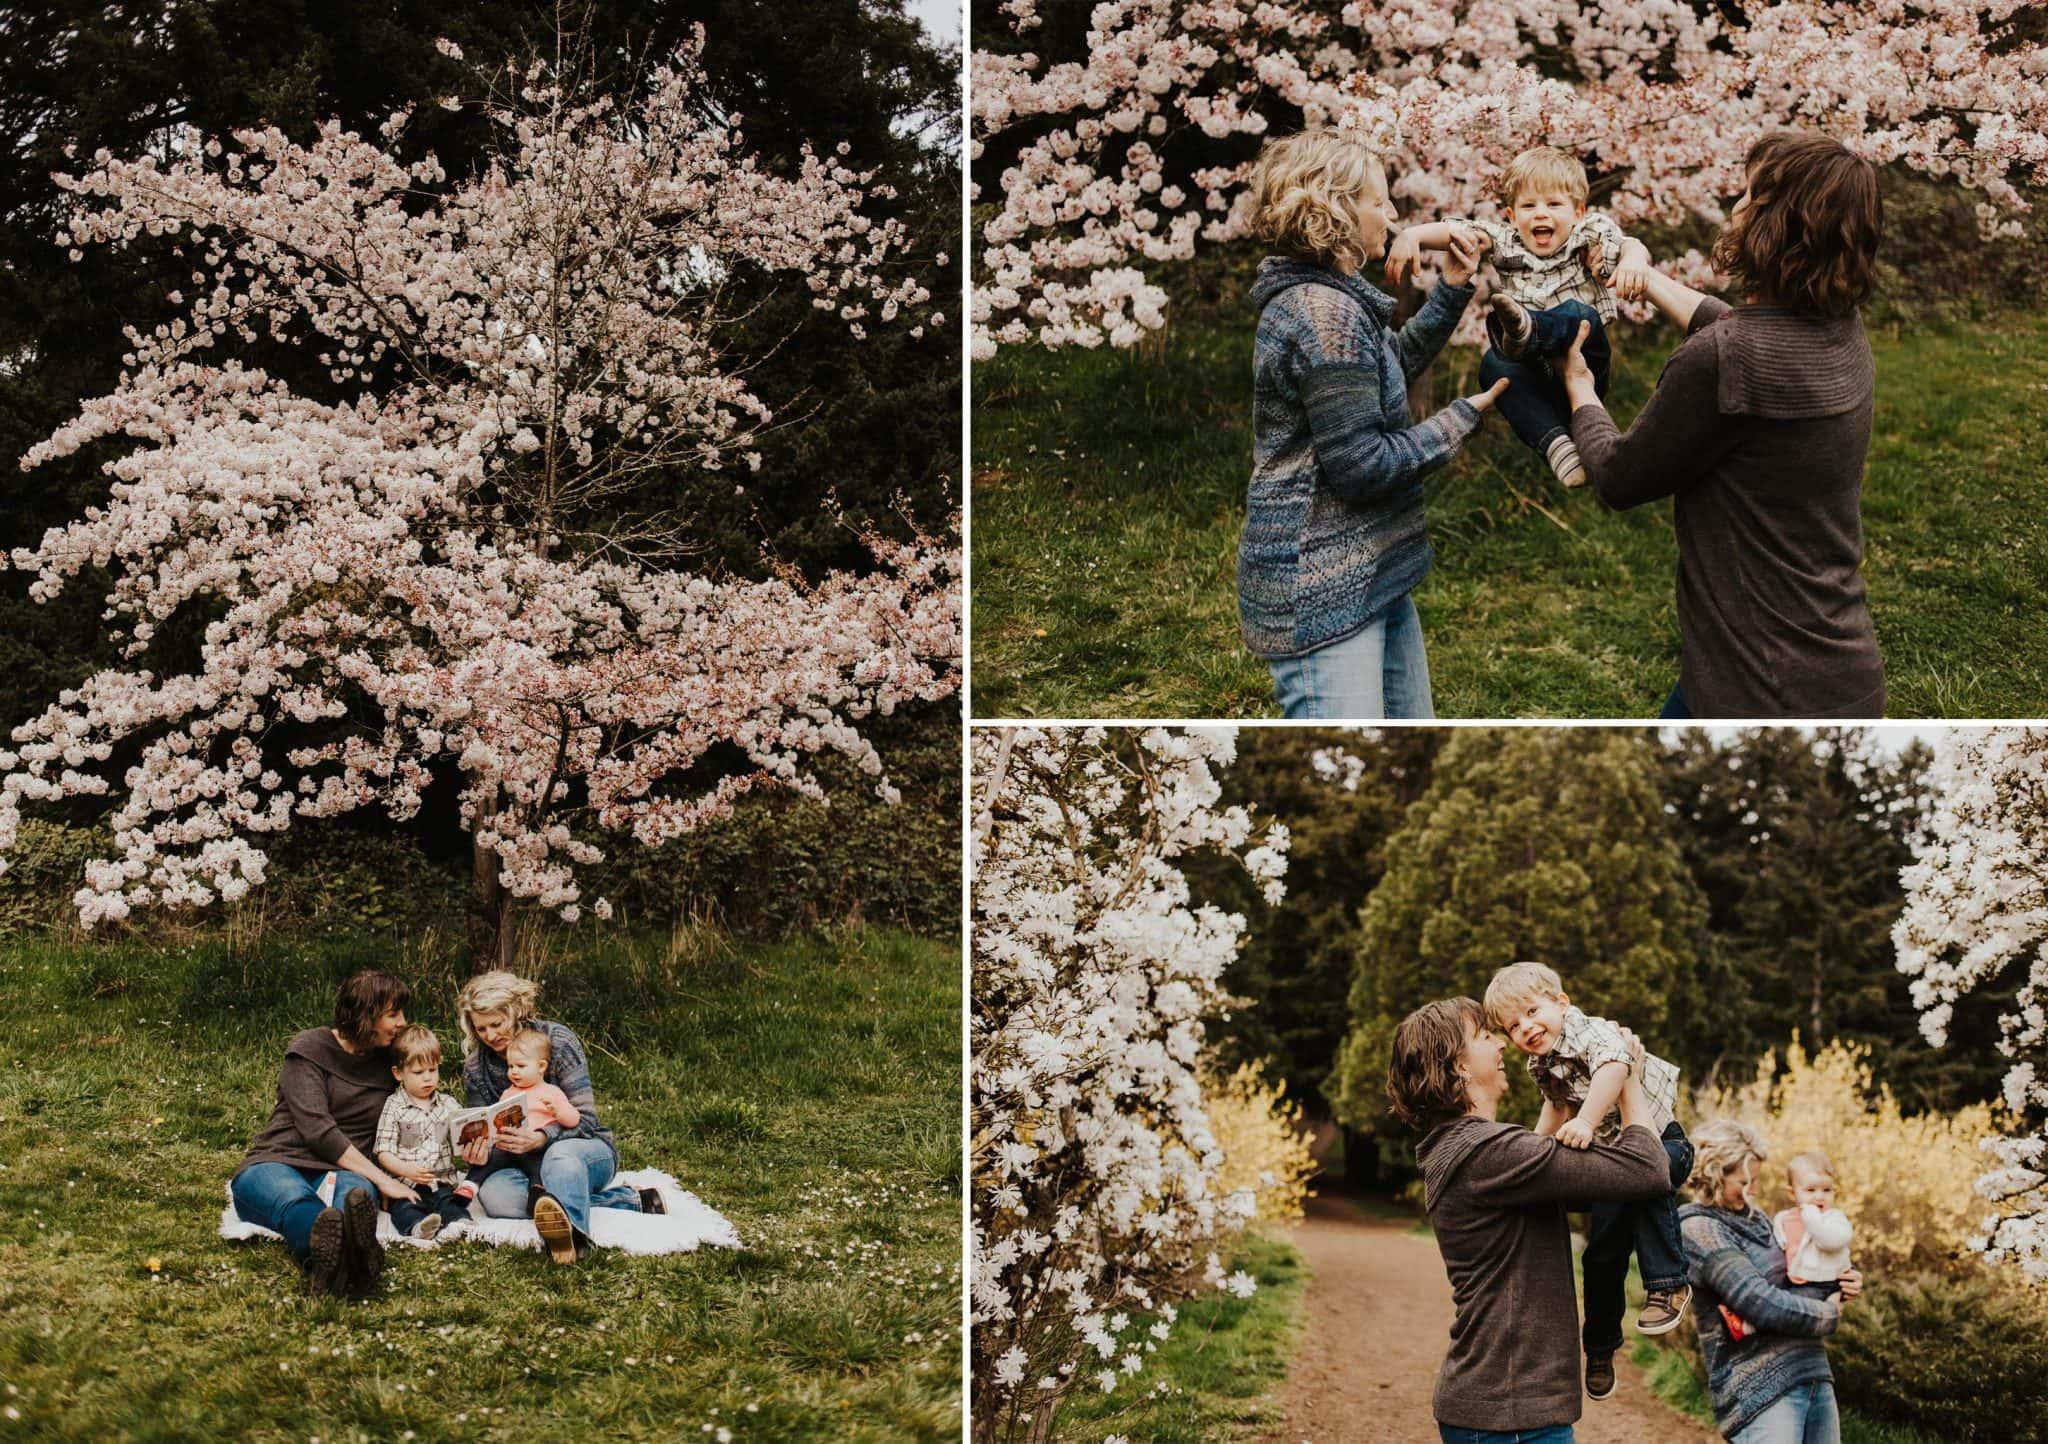 portland cherry blossoms photography spring - spring season family photos